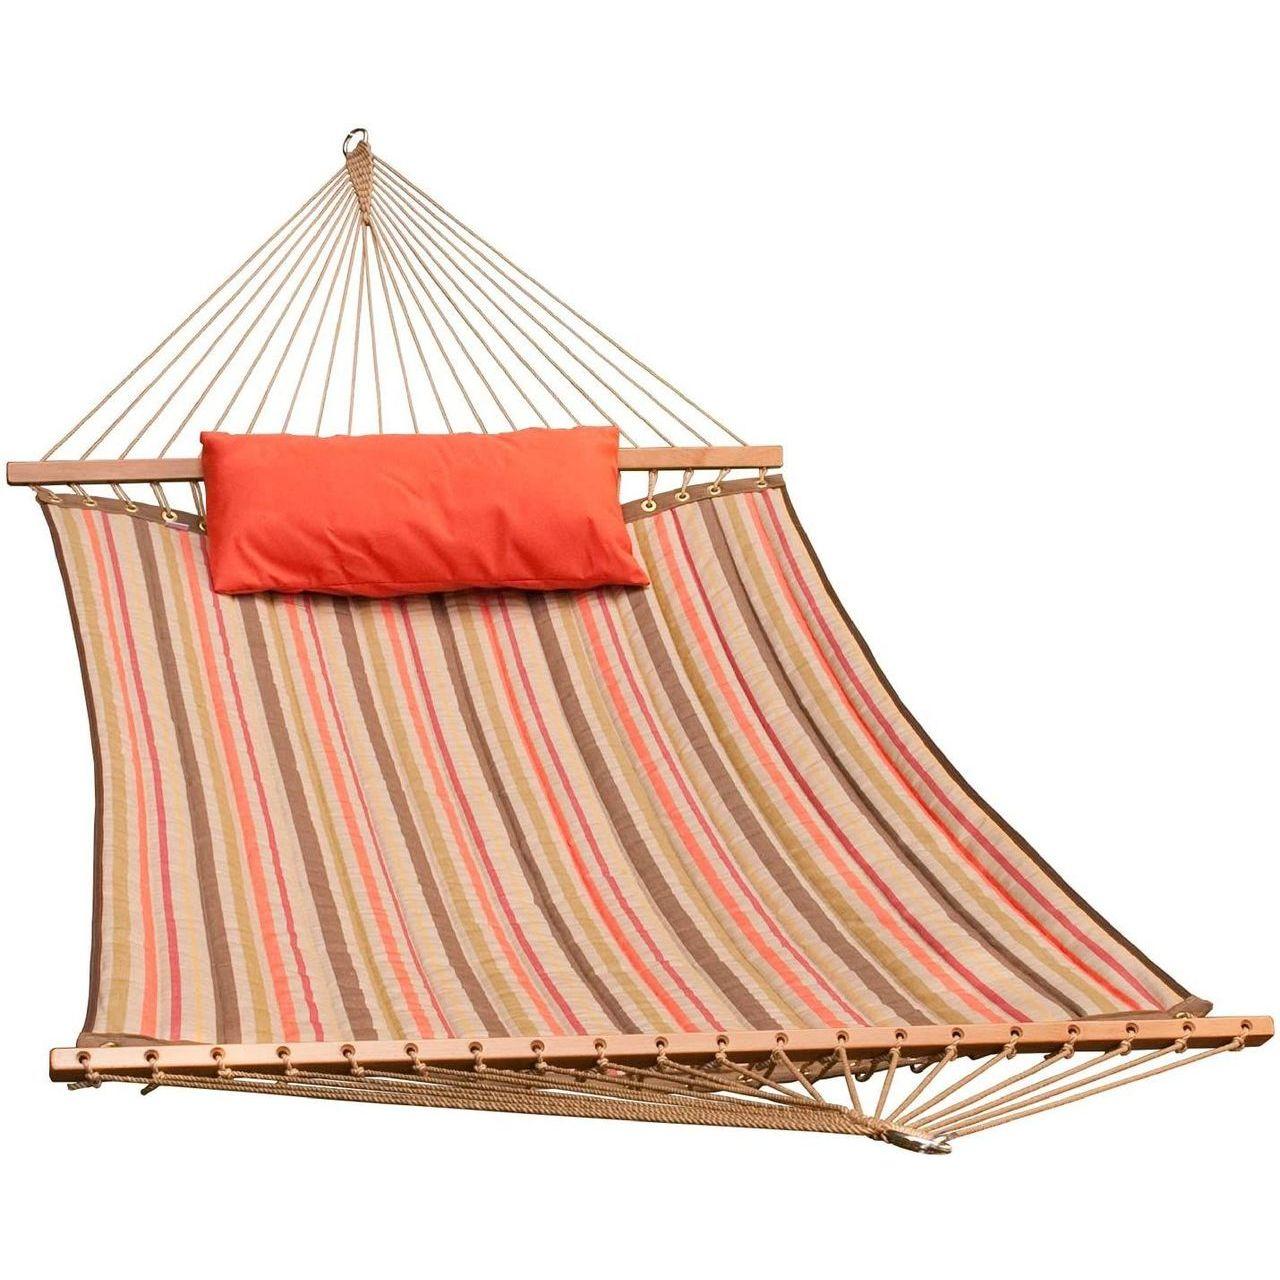 Gleason Reversible Sunbrella Quilted Hammock - Orange/Brown Stripe